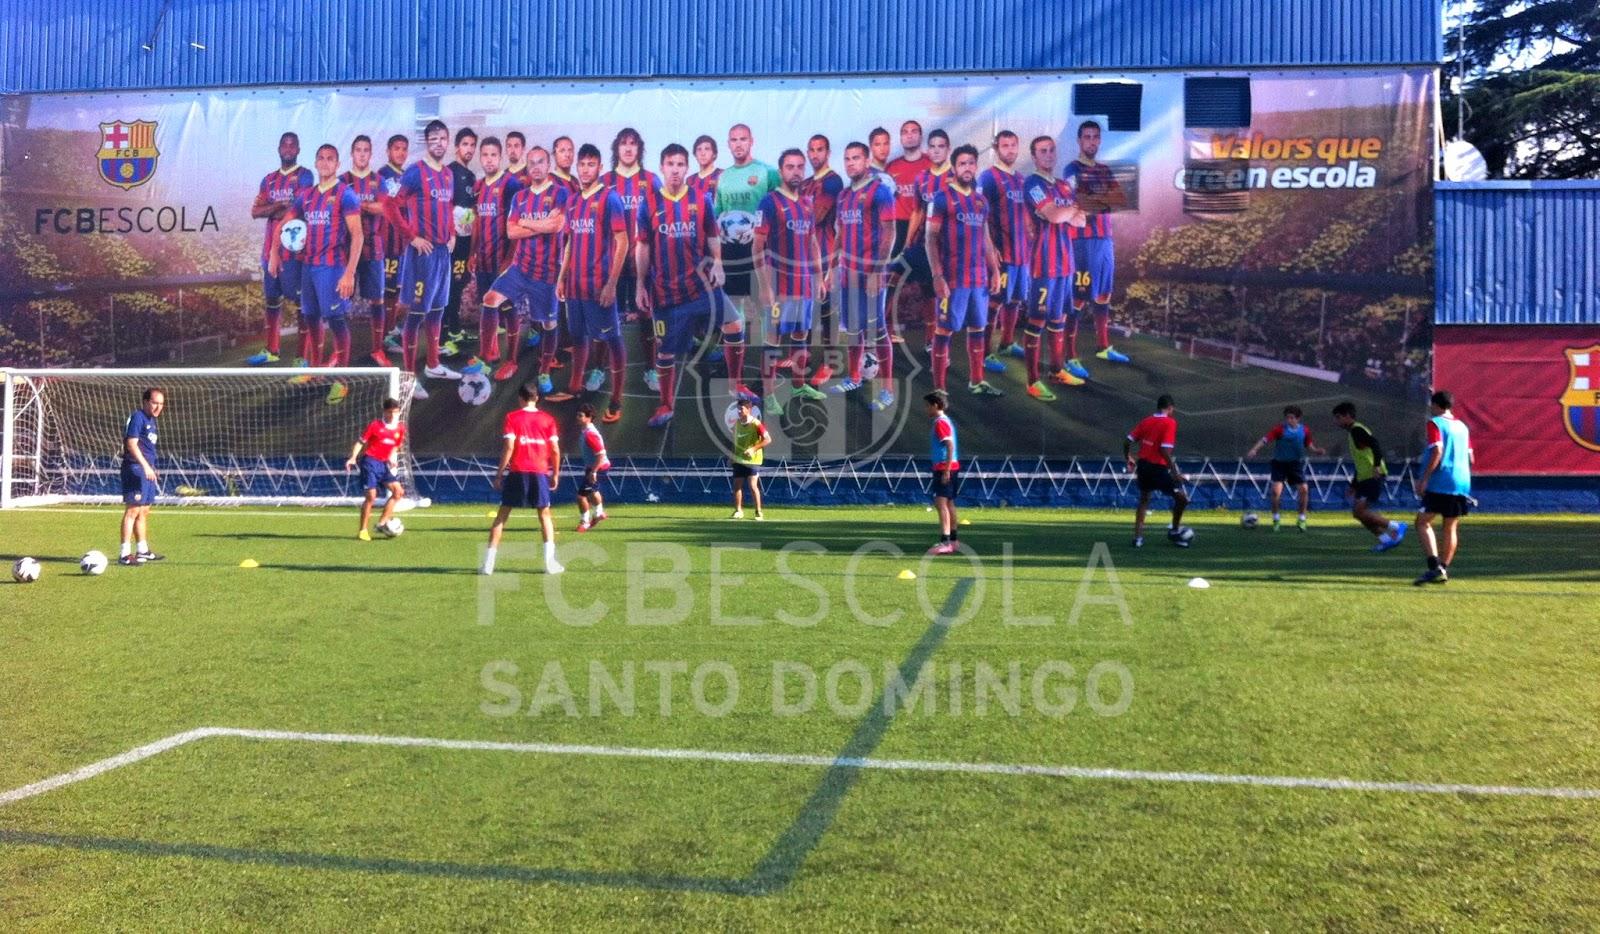 Experiencia Barca-Delegación Dominicana visita Camp Nou